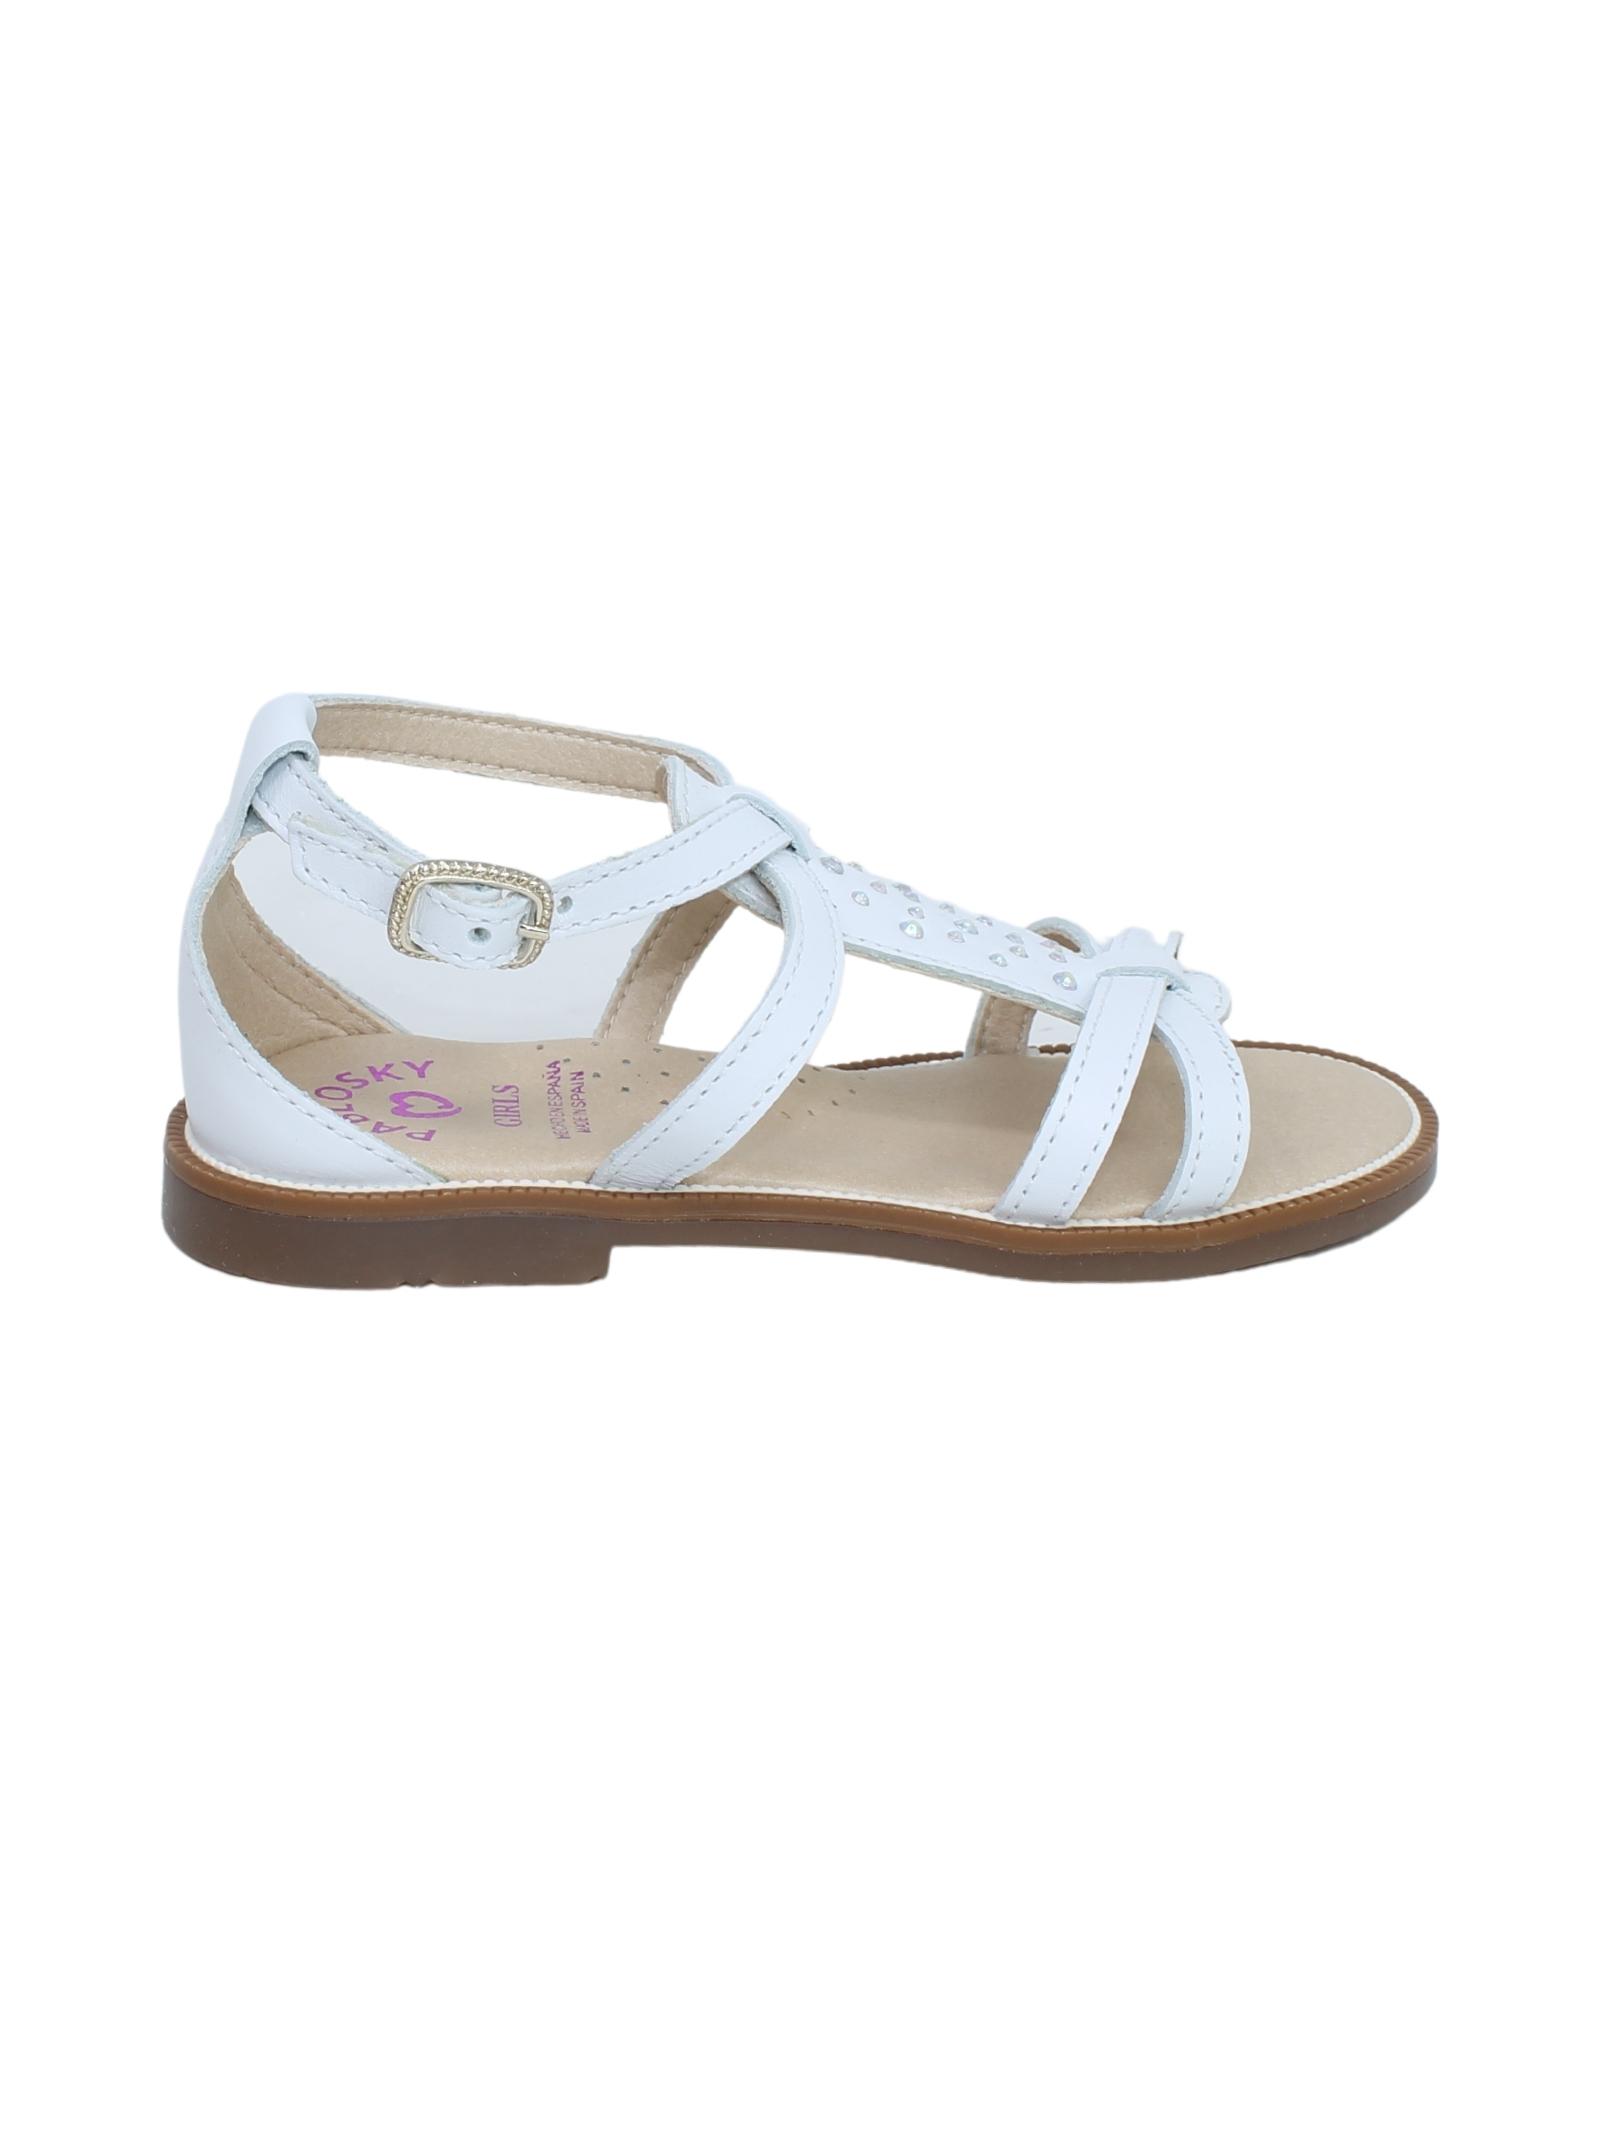 Sandalo Bambina Strass PABLOSKY | Sandali | 496700BIANCO